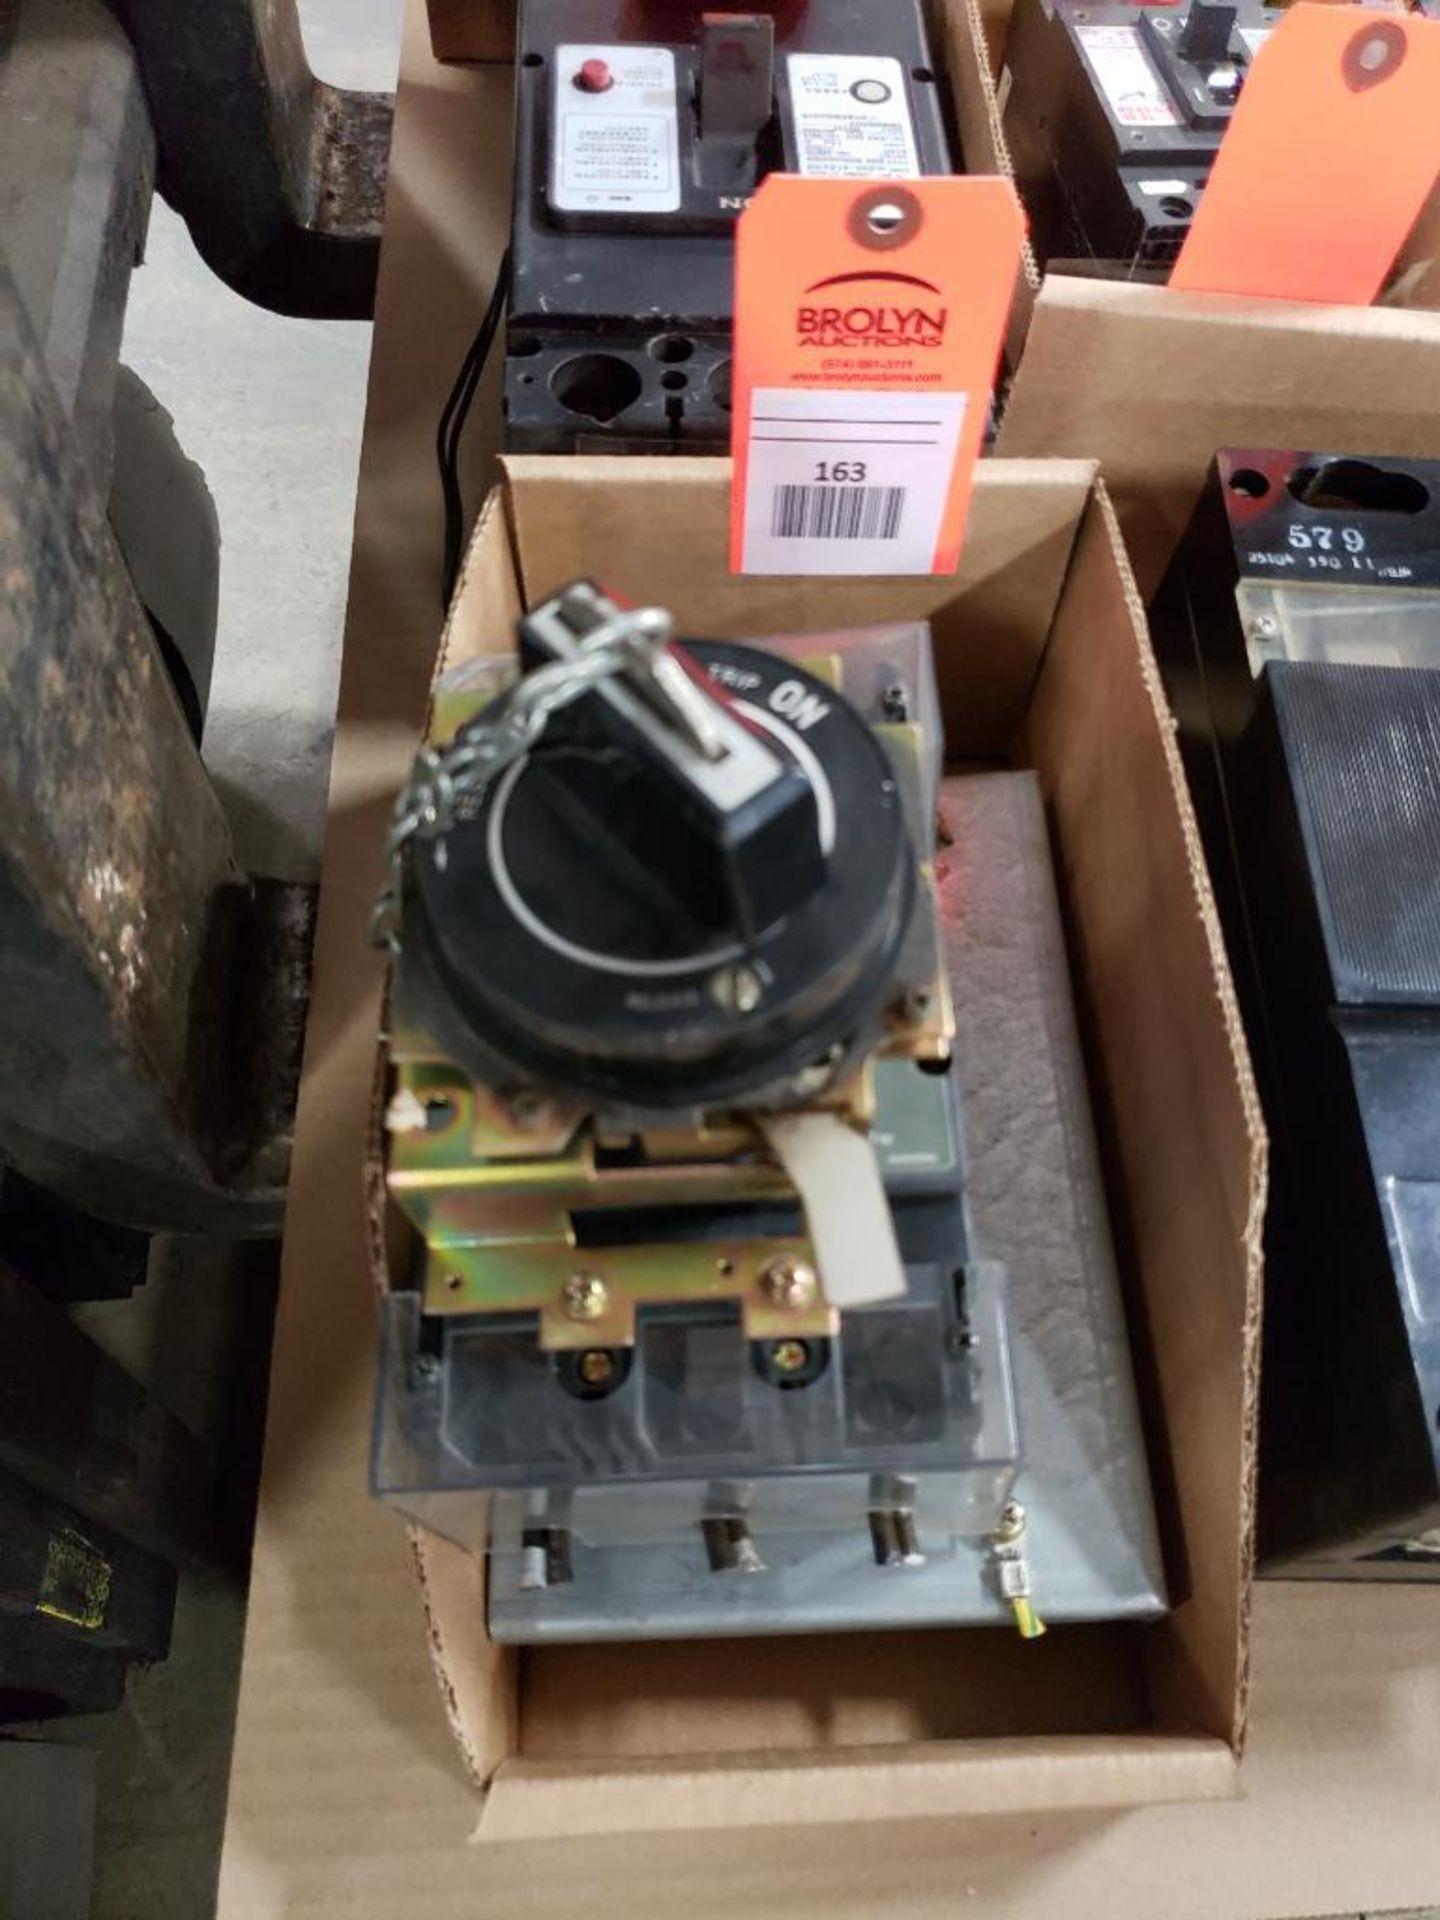 Fuji BU-FHB3020 Circuit Breaker safety switch.